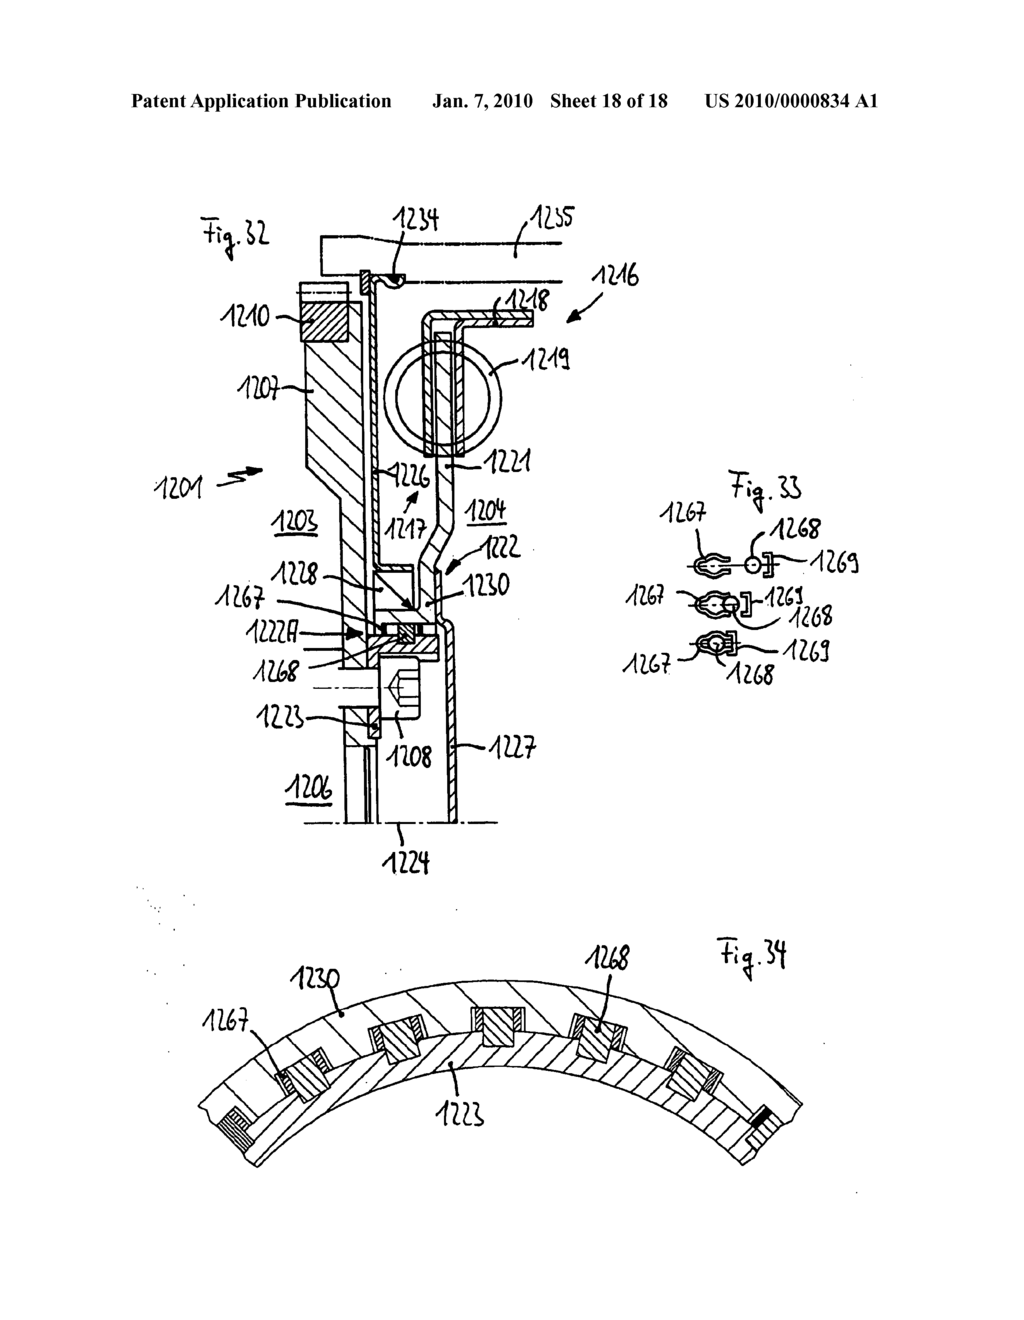 Drivetrain with a main drive shaft and drivetrain for a motor